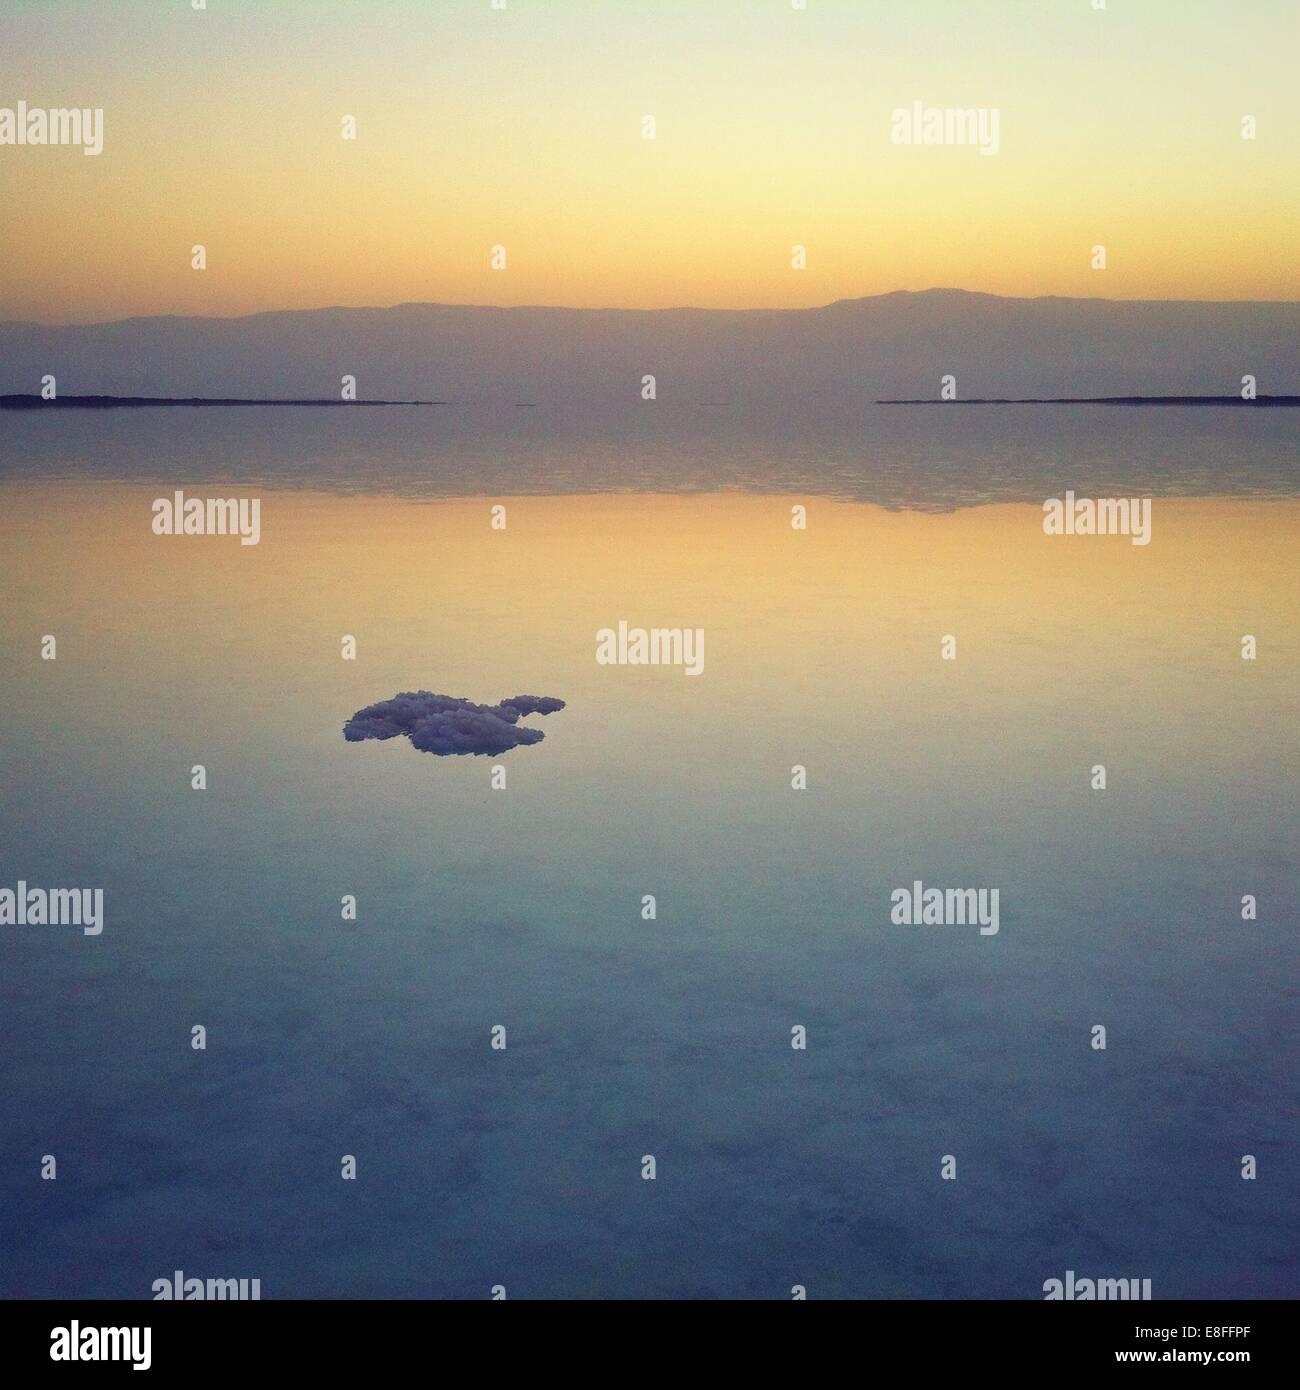 Sunrise over the Dead Sea, Israel - Stock Image